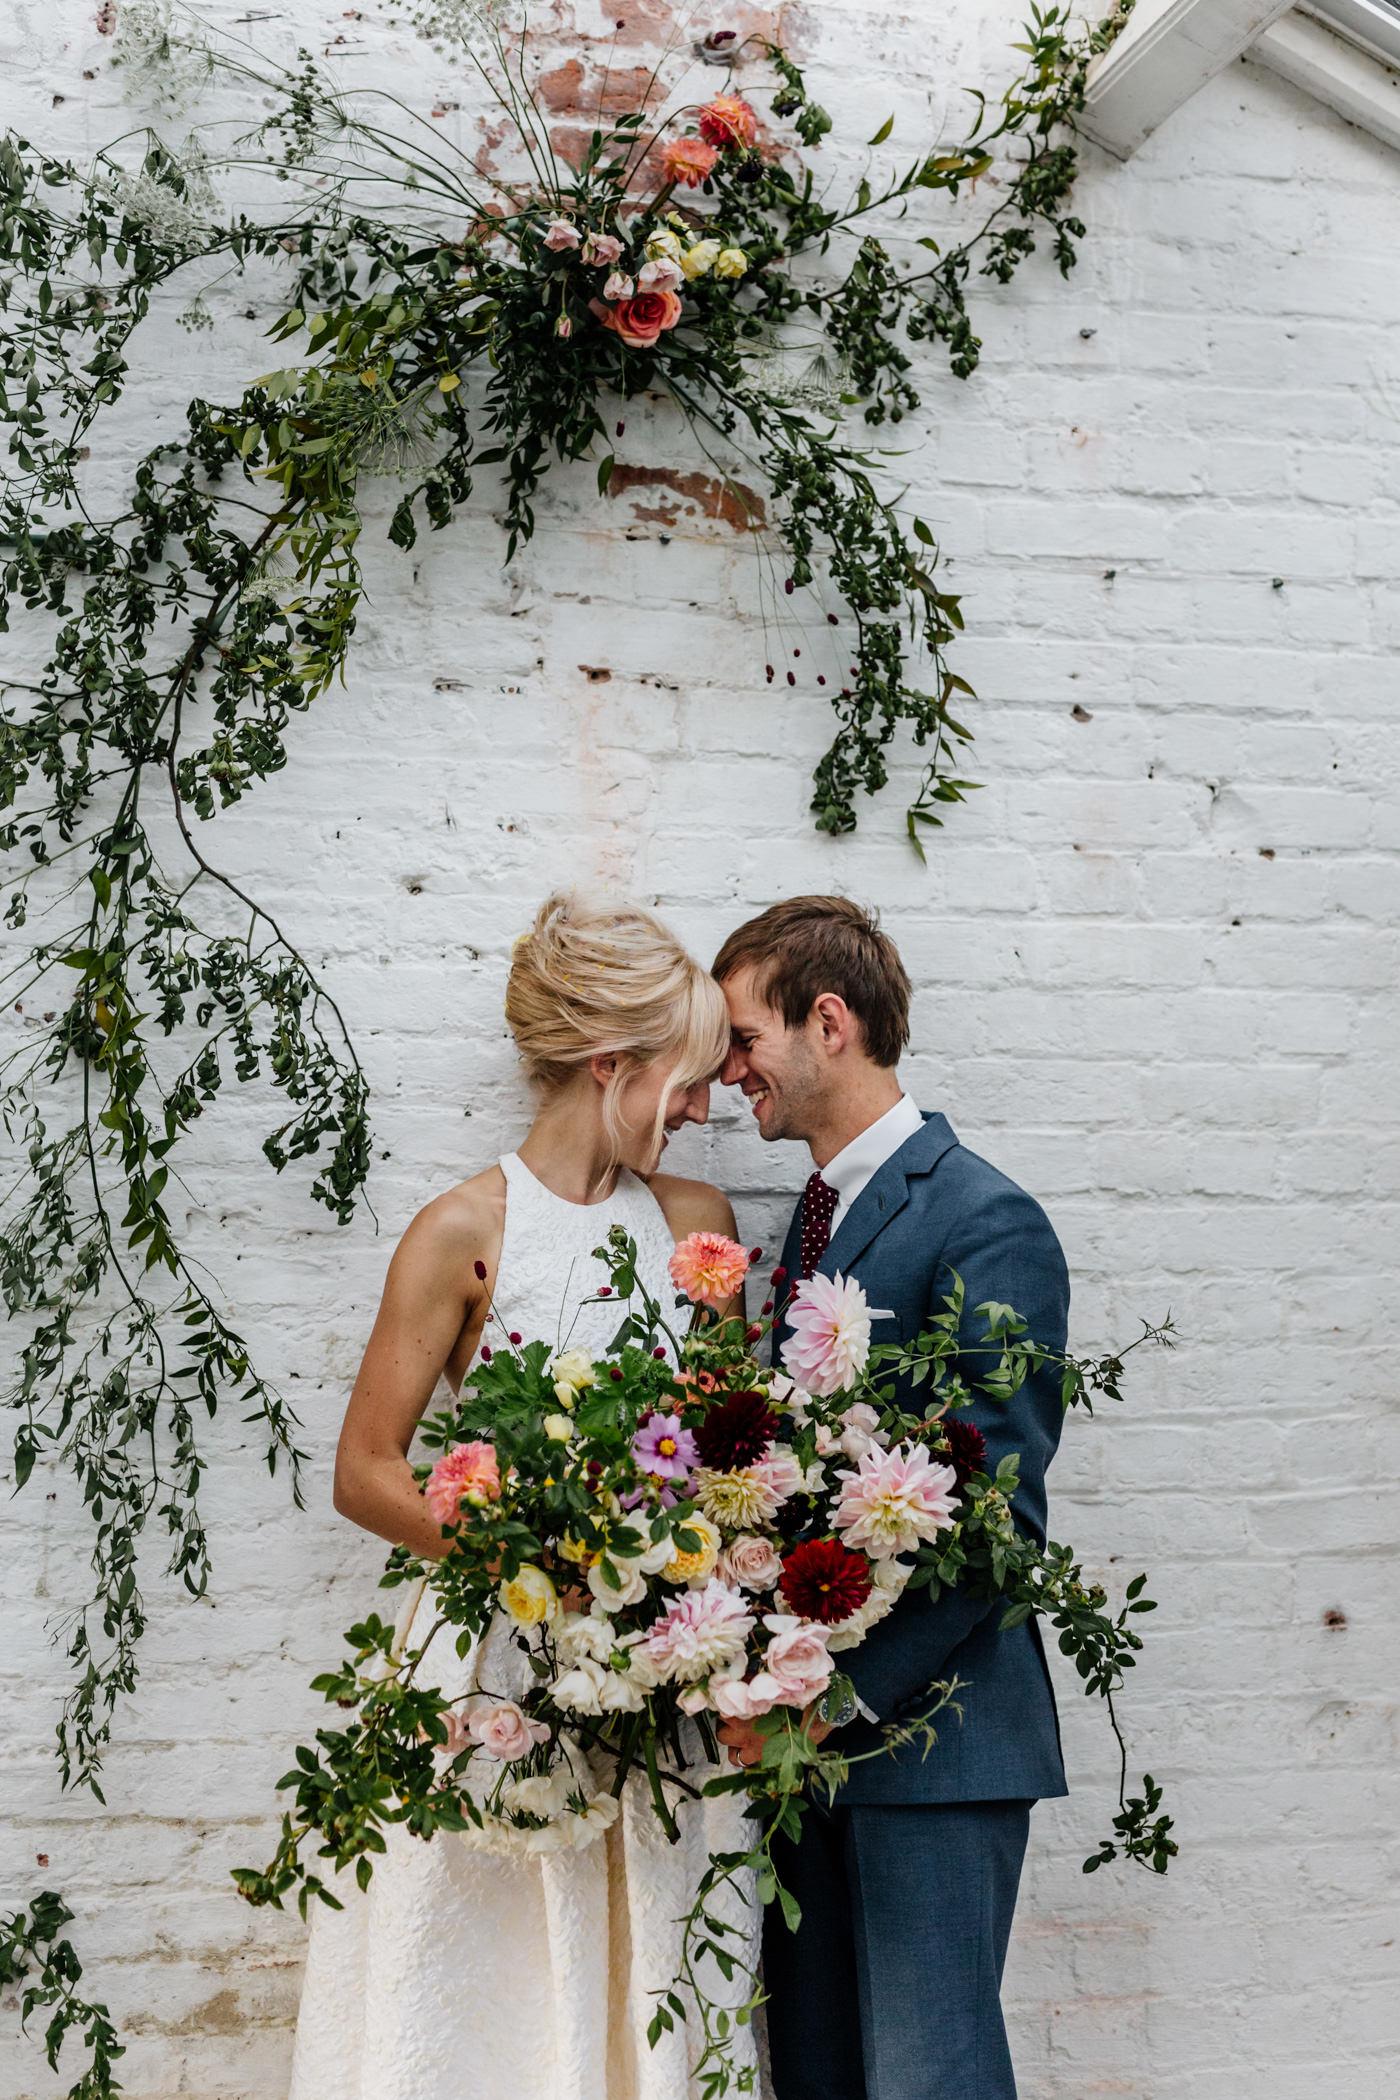 Garthmyl Hall wedding photographer wales